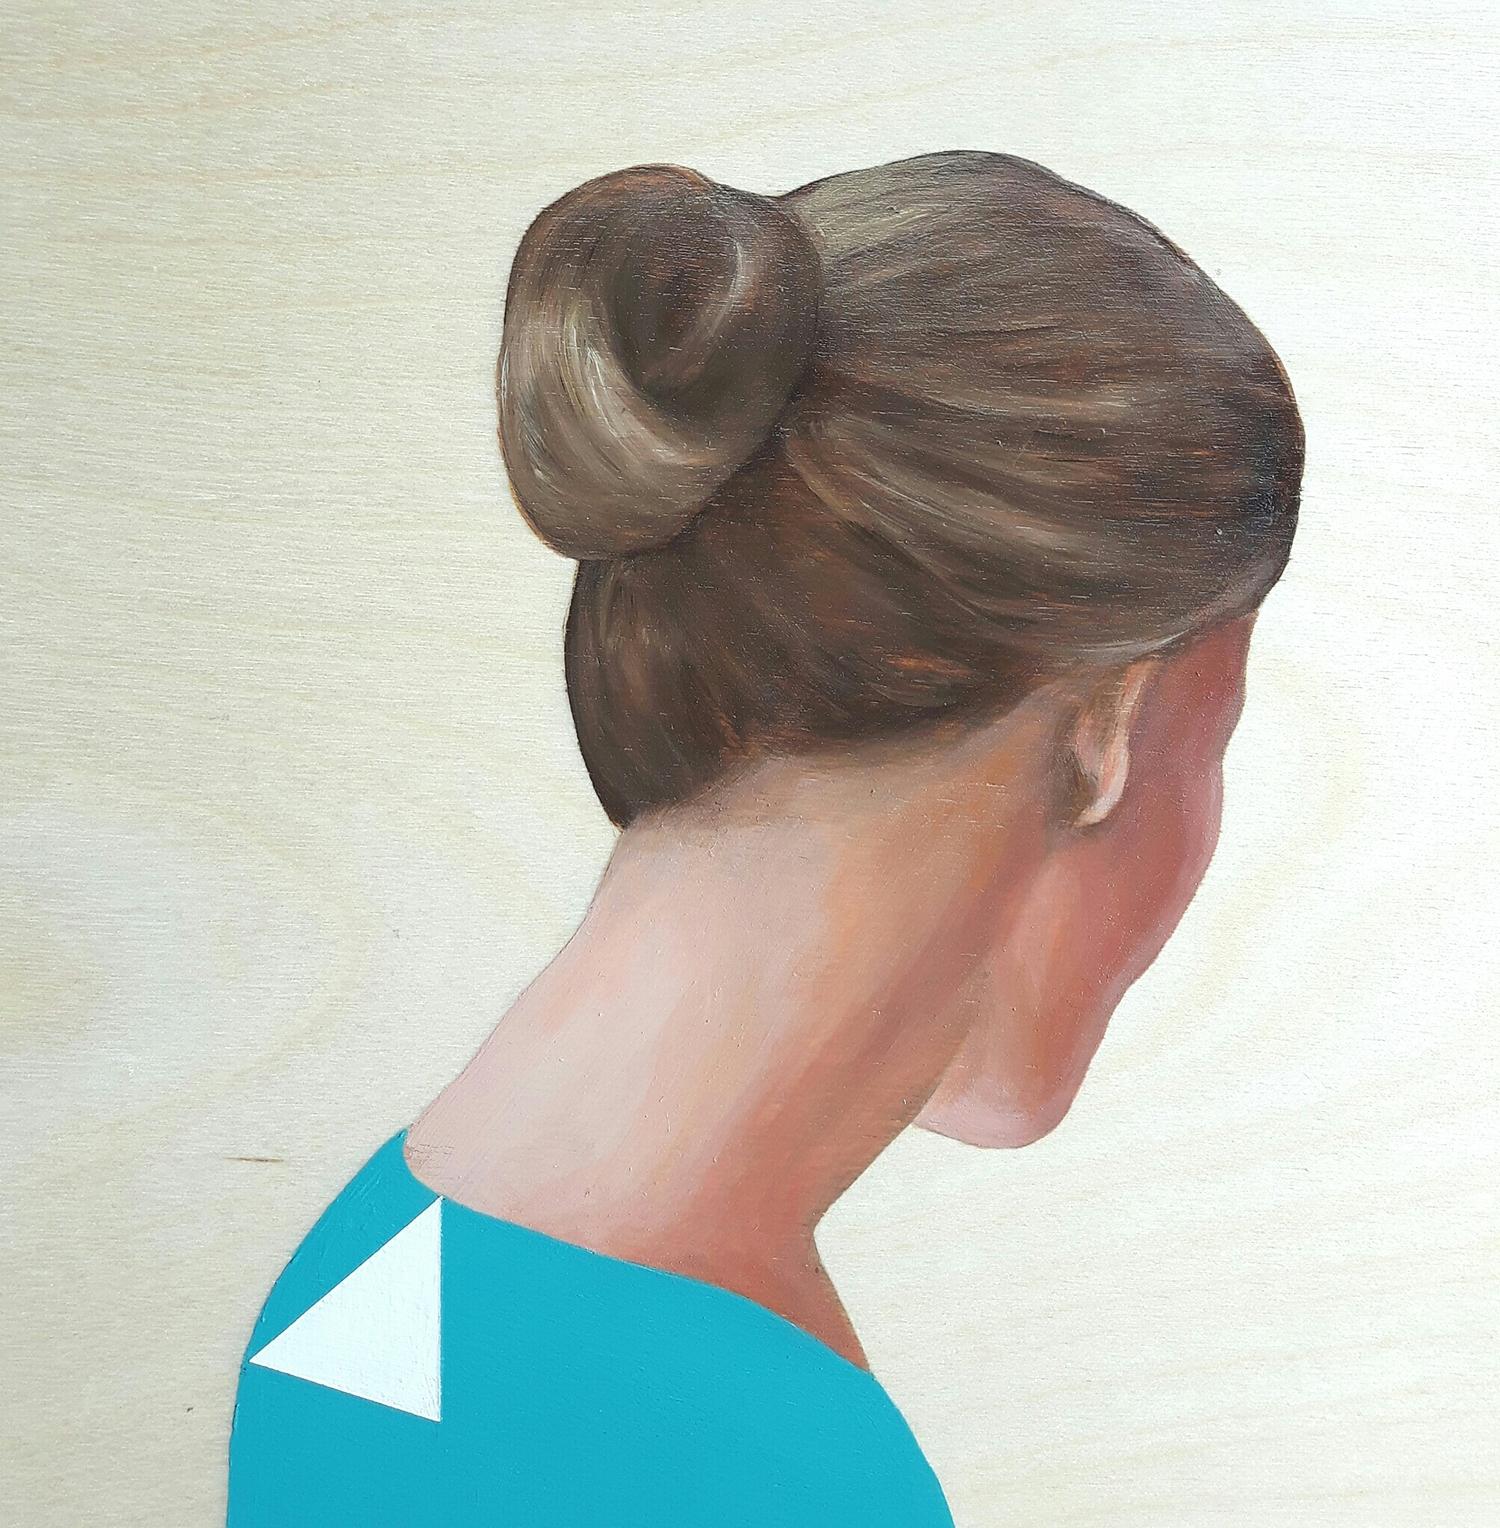 Lady in Light Blue Shirt by Marina  Nazarova